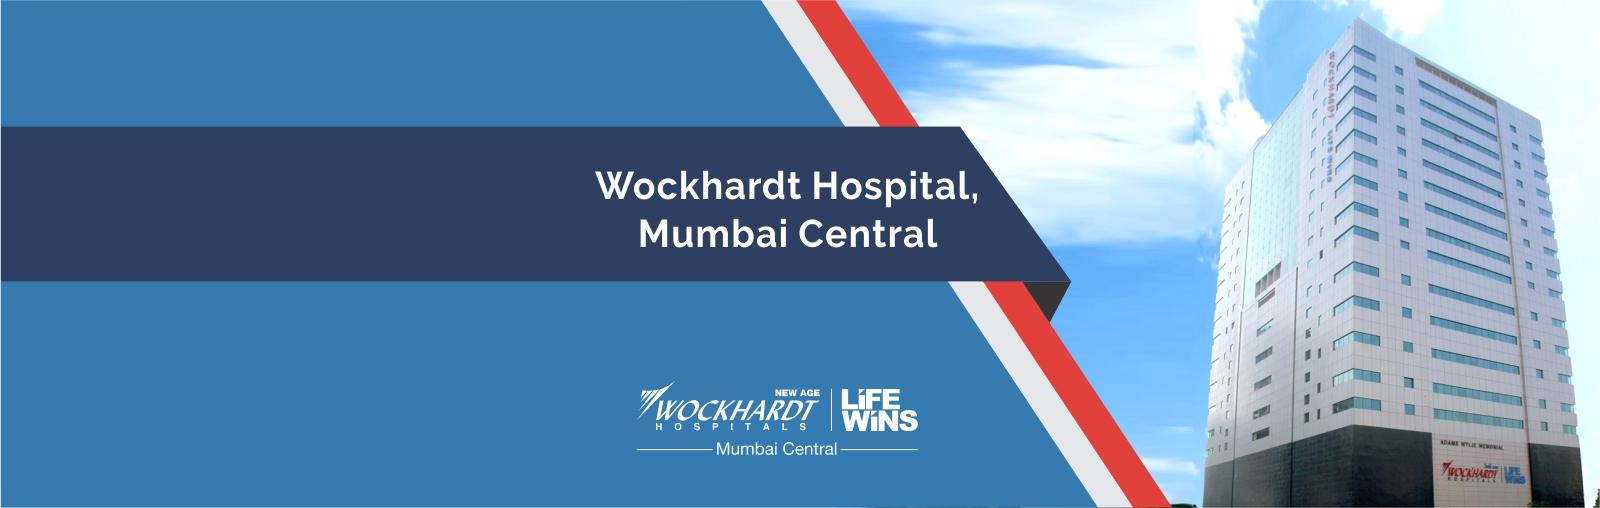 Wockhardt Hospital South Mumbai